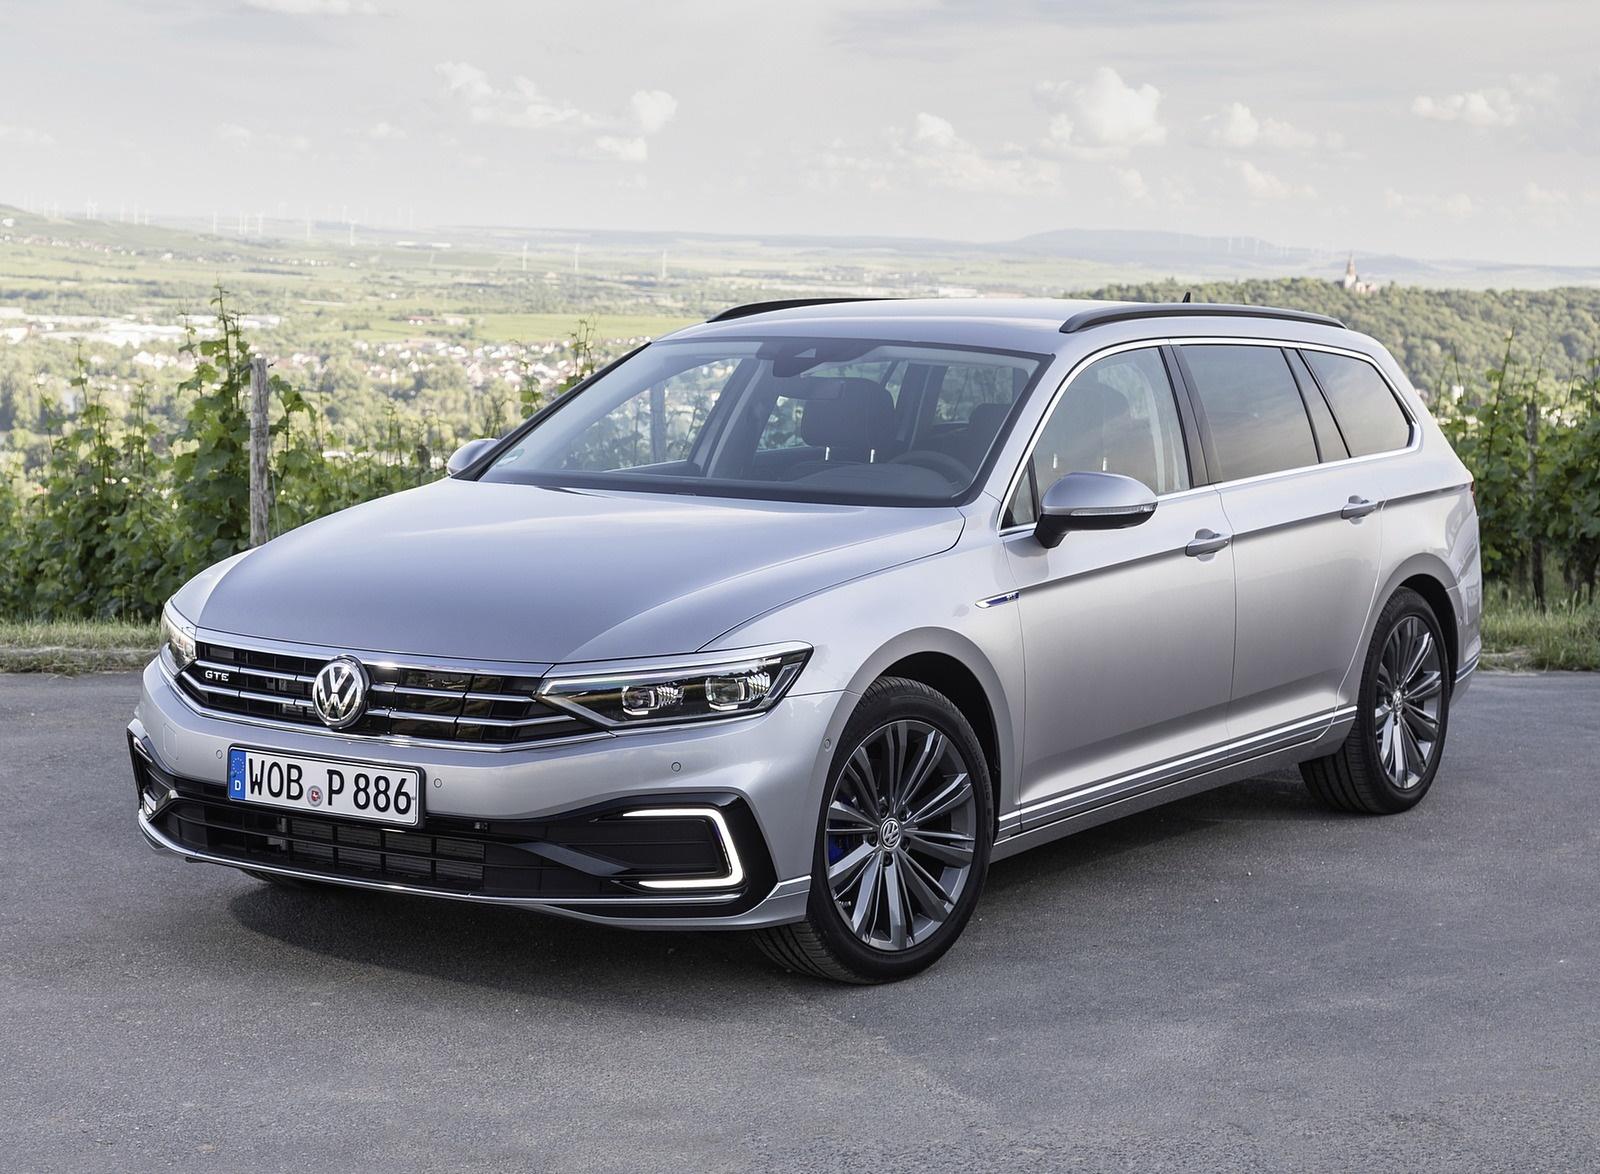 2020 Volkswagen Passat GTE Variant (Plug-In Hybrid EU-Spec) Front Three-Quarter Wallpapers (12)